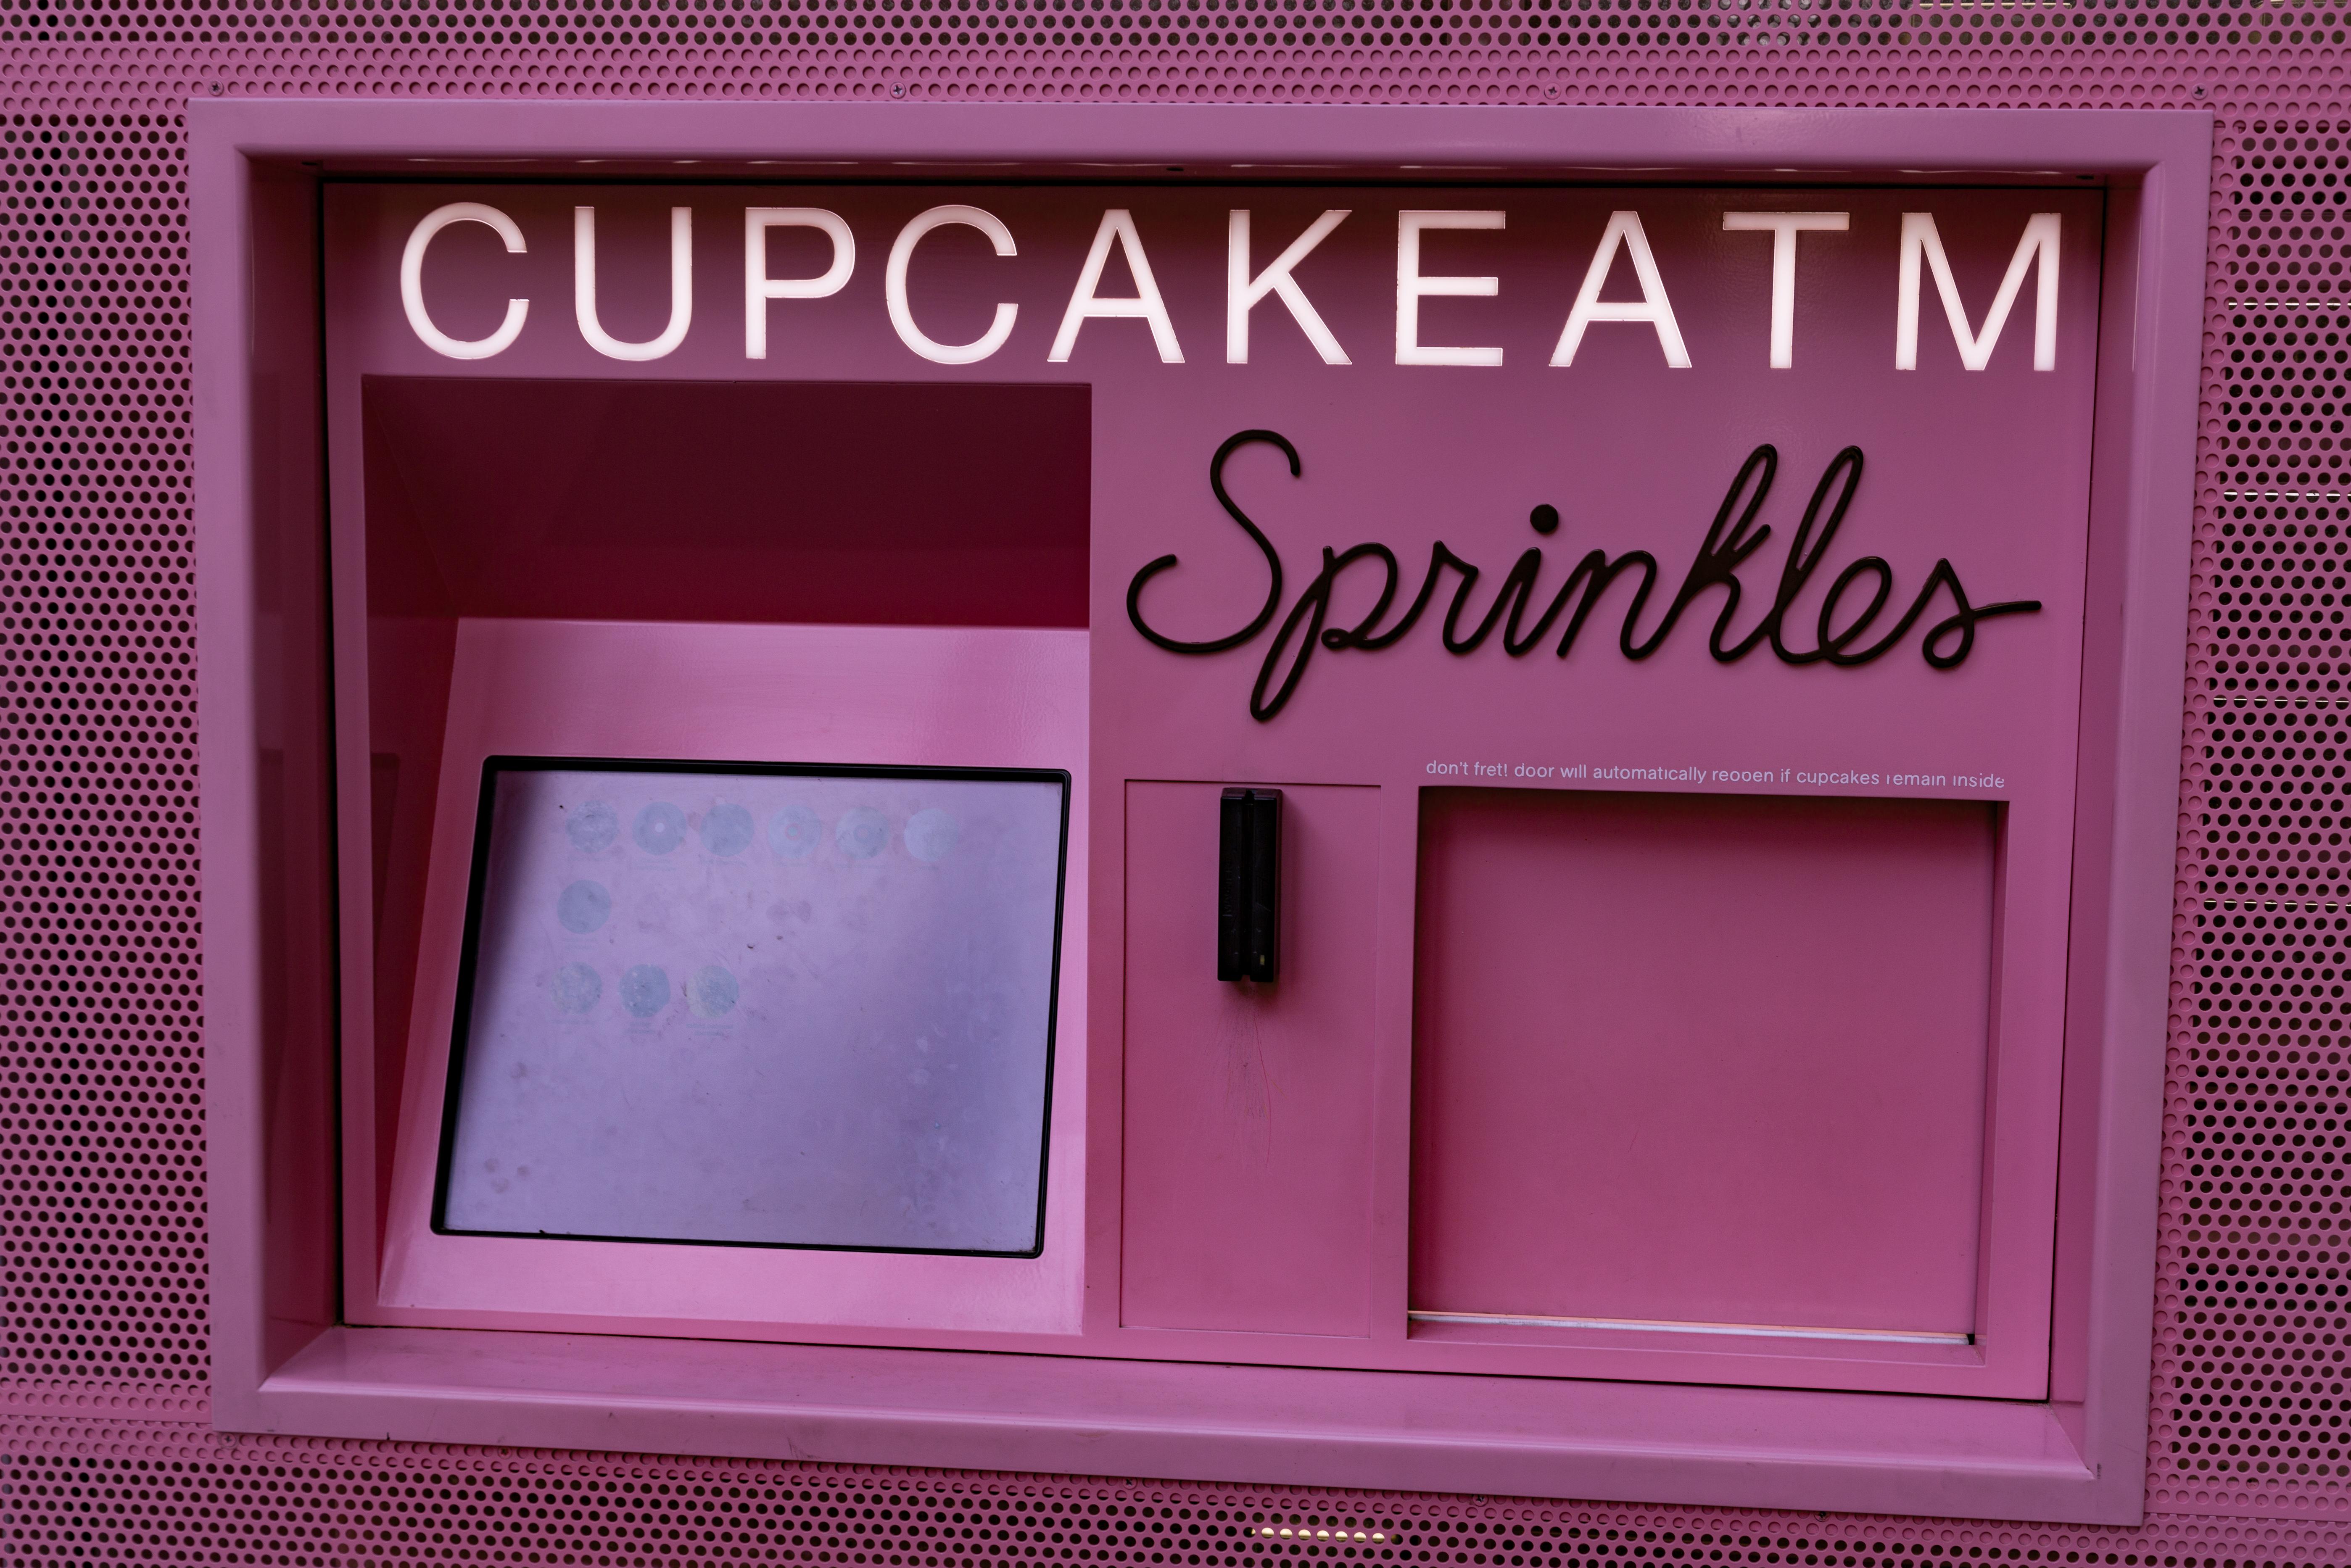 sprinkles cupcakes san francisco